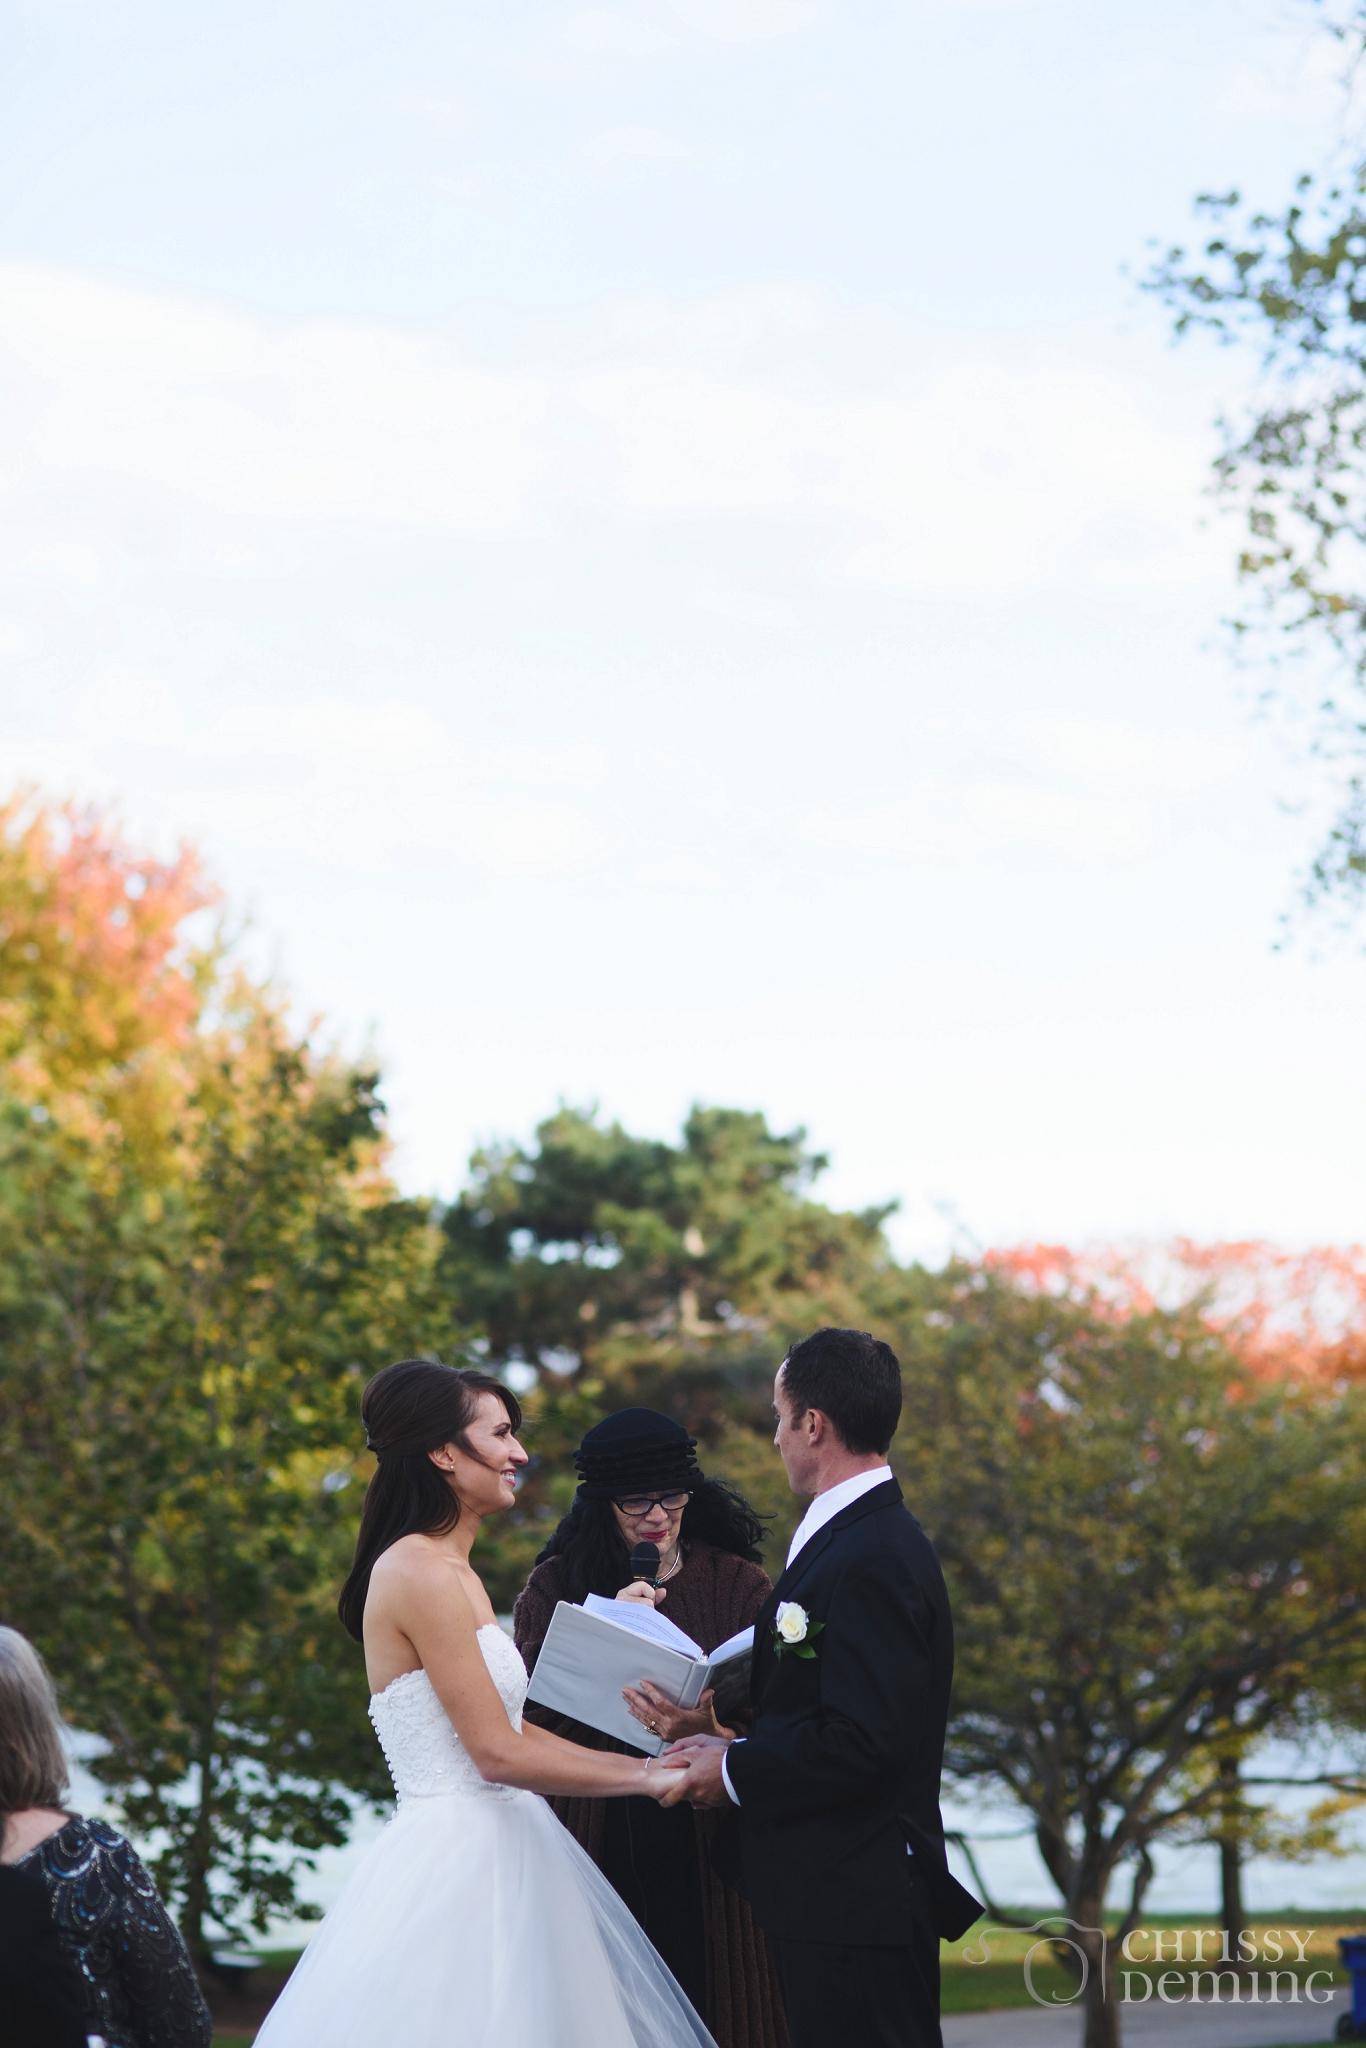 promontory_point_chicago_wedding_photography_0012.jpg